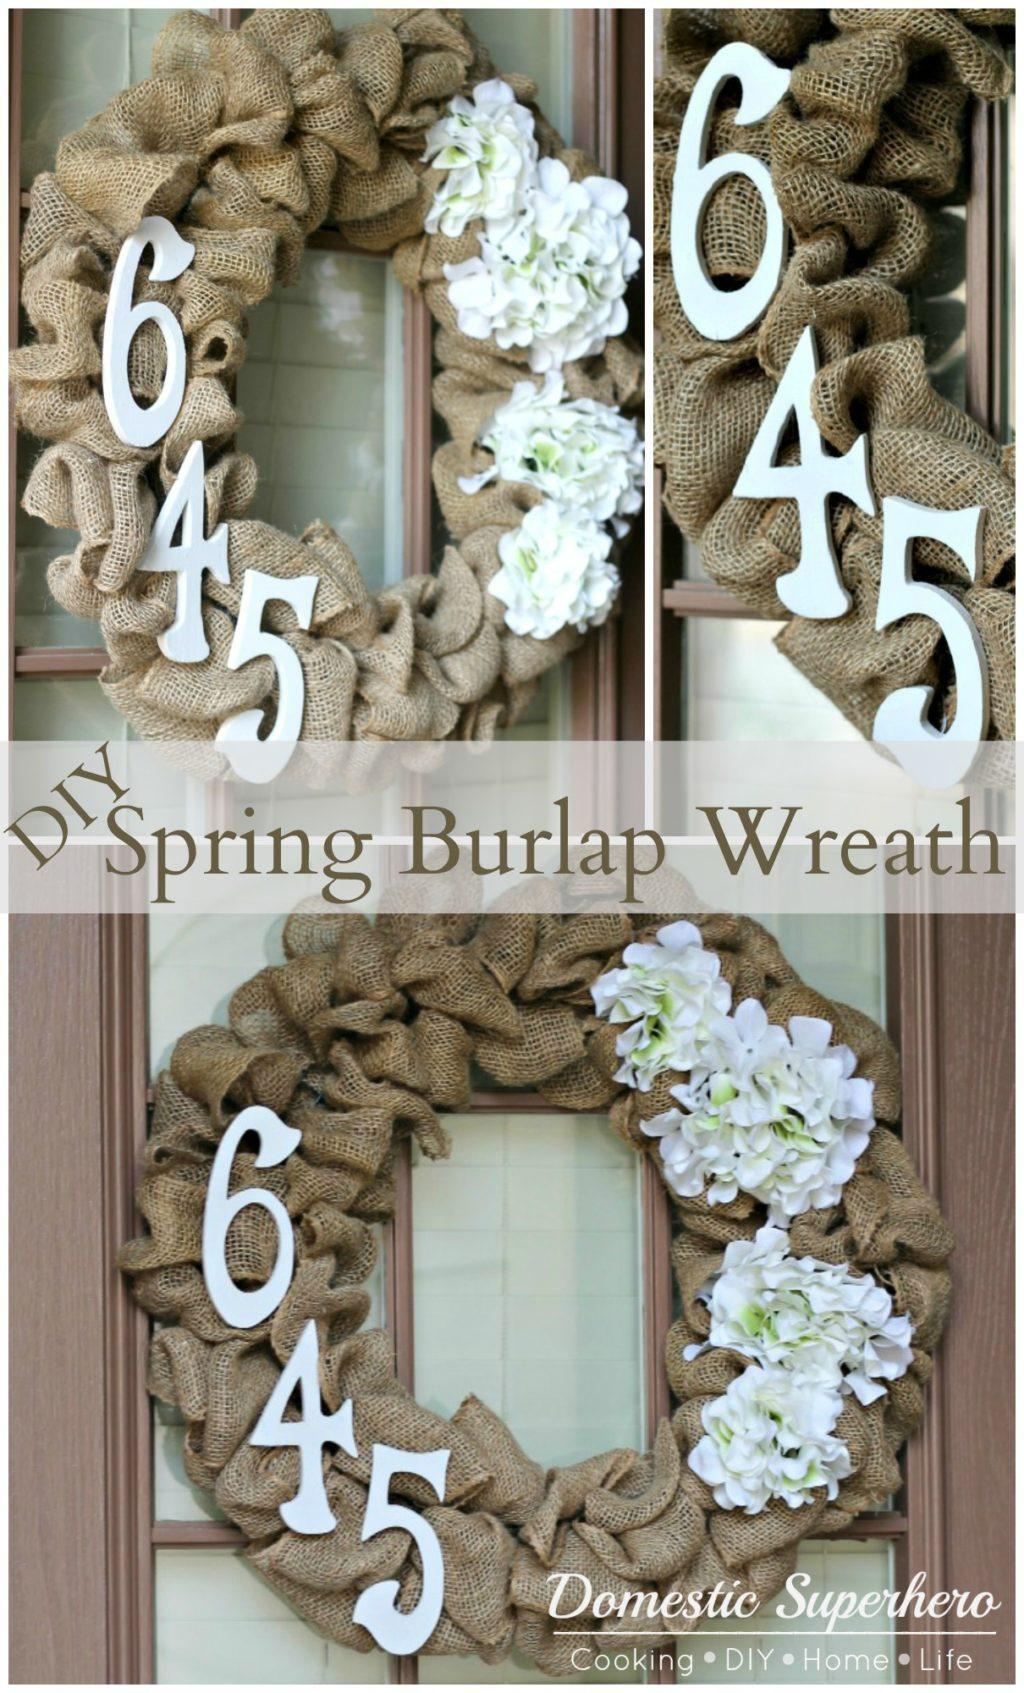 DIY Spring Burlap Wreath - Domestic Superhero